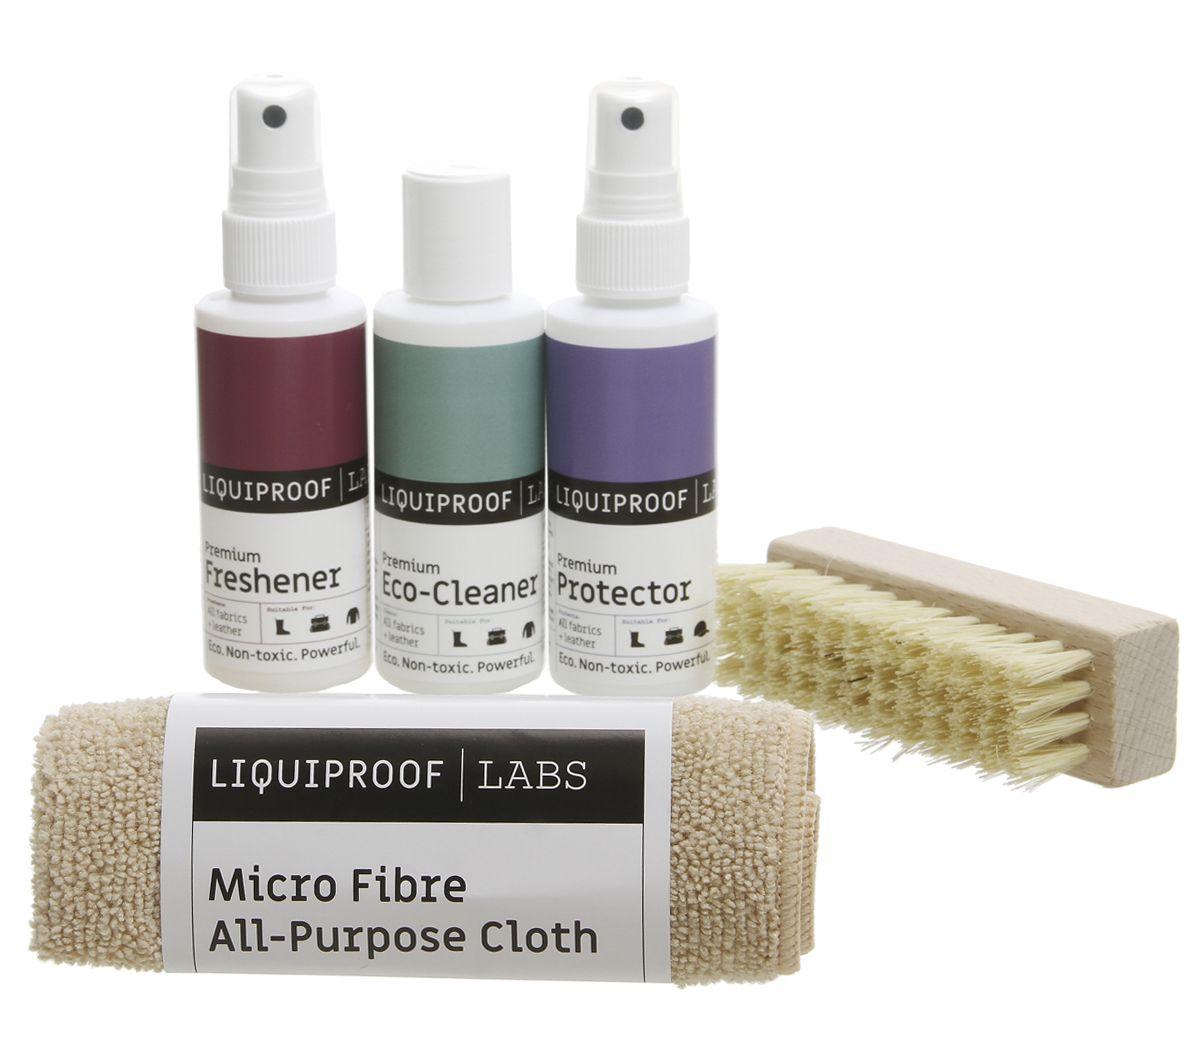 Liquiproof Complete Starter Kit